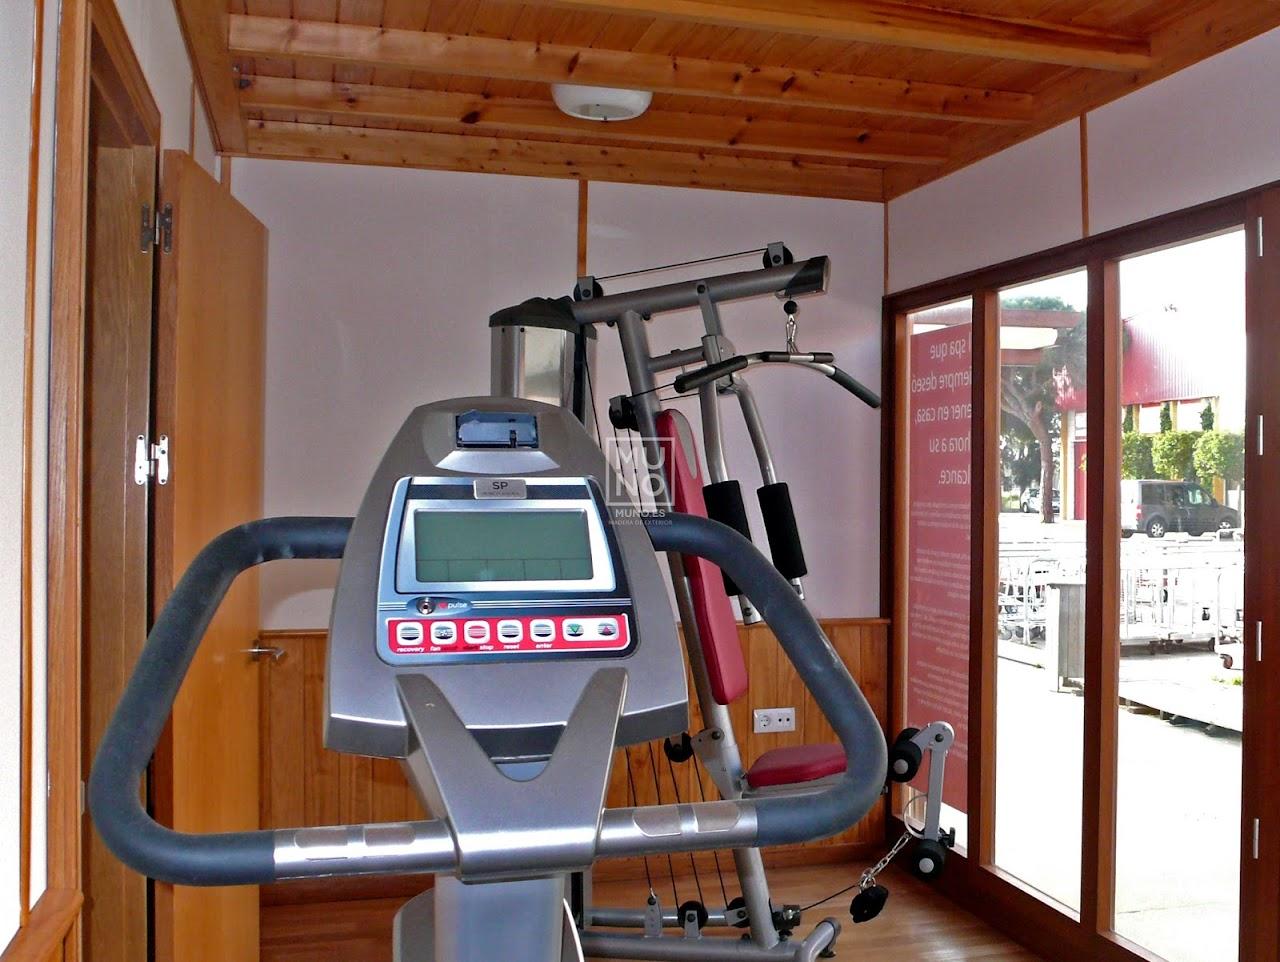 Pasarela madera restaurante madera chiringuito for Centro fitness